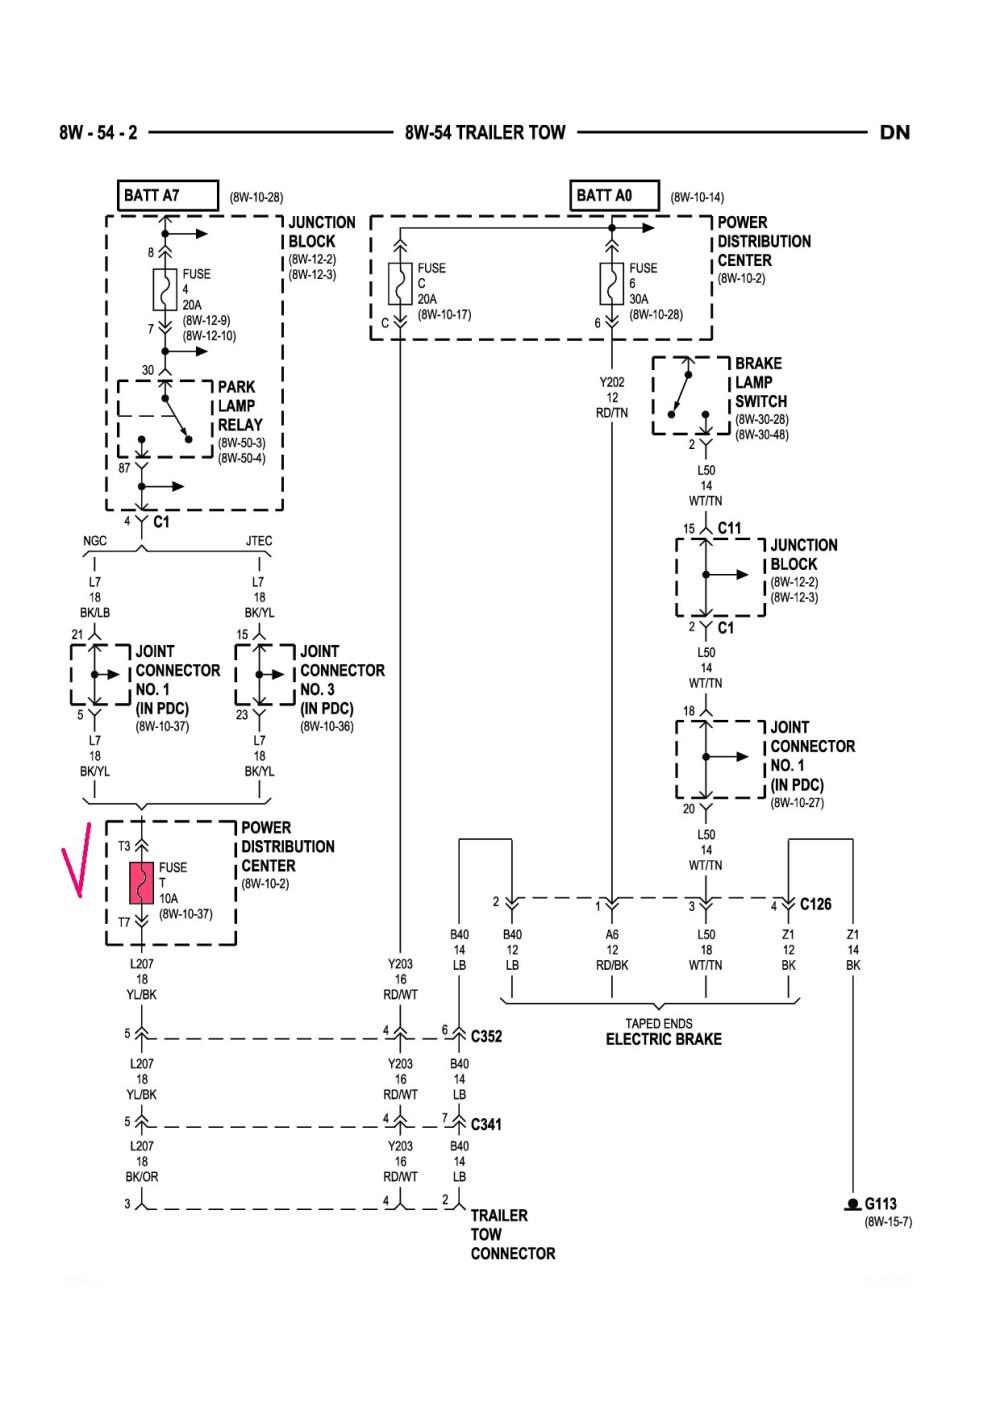 medium resolution of 2005 dodge durango engine diagram best dodge durango wiring diagram ideas everything you need to of